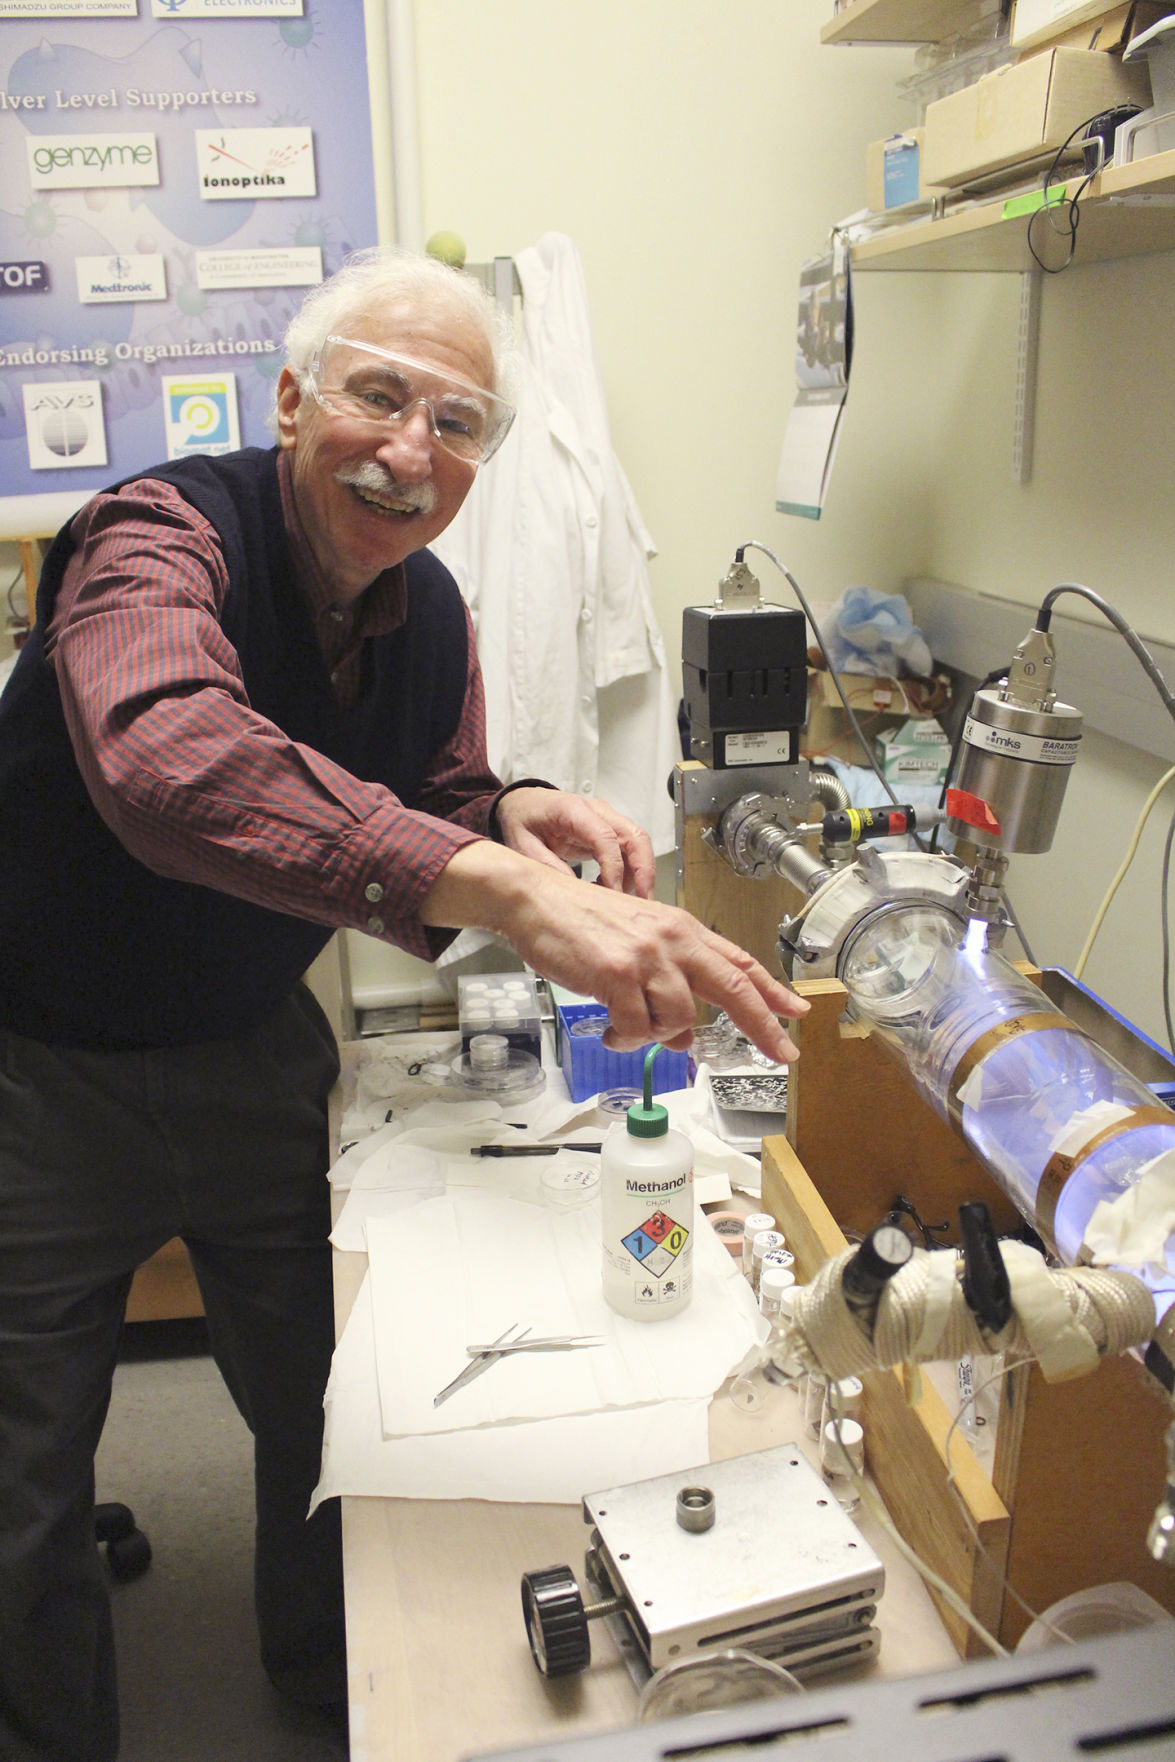 Dr. Buddy Ratner